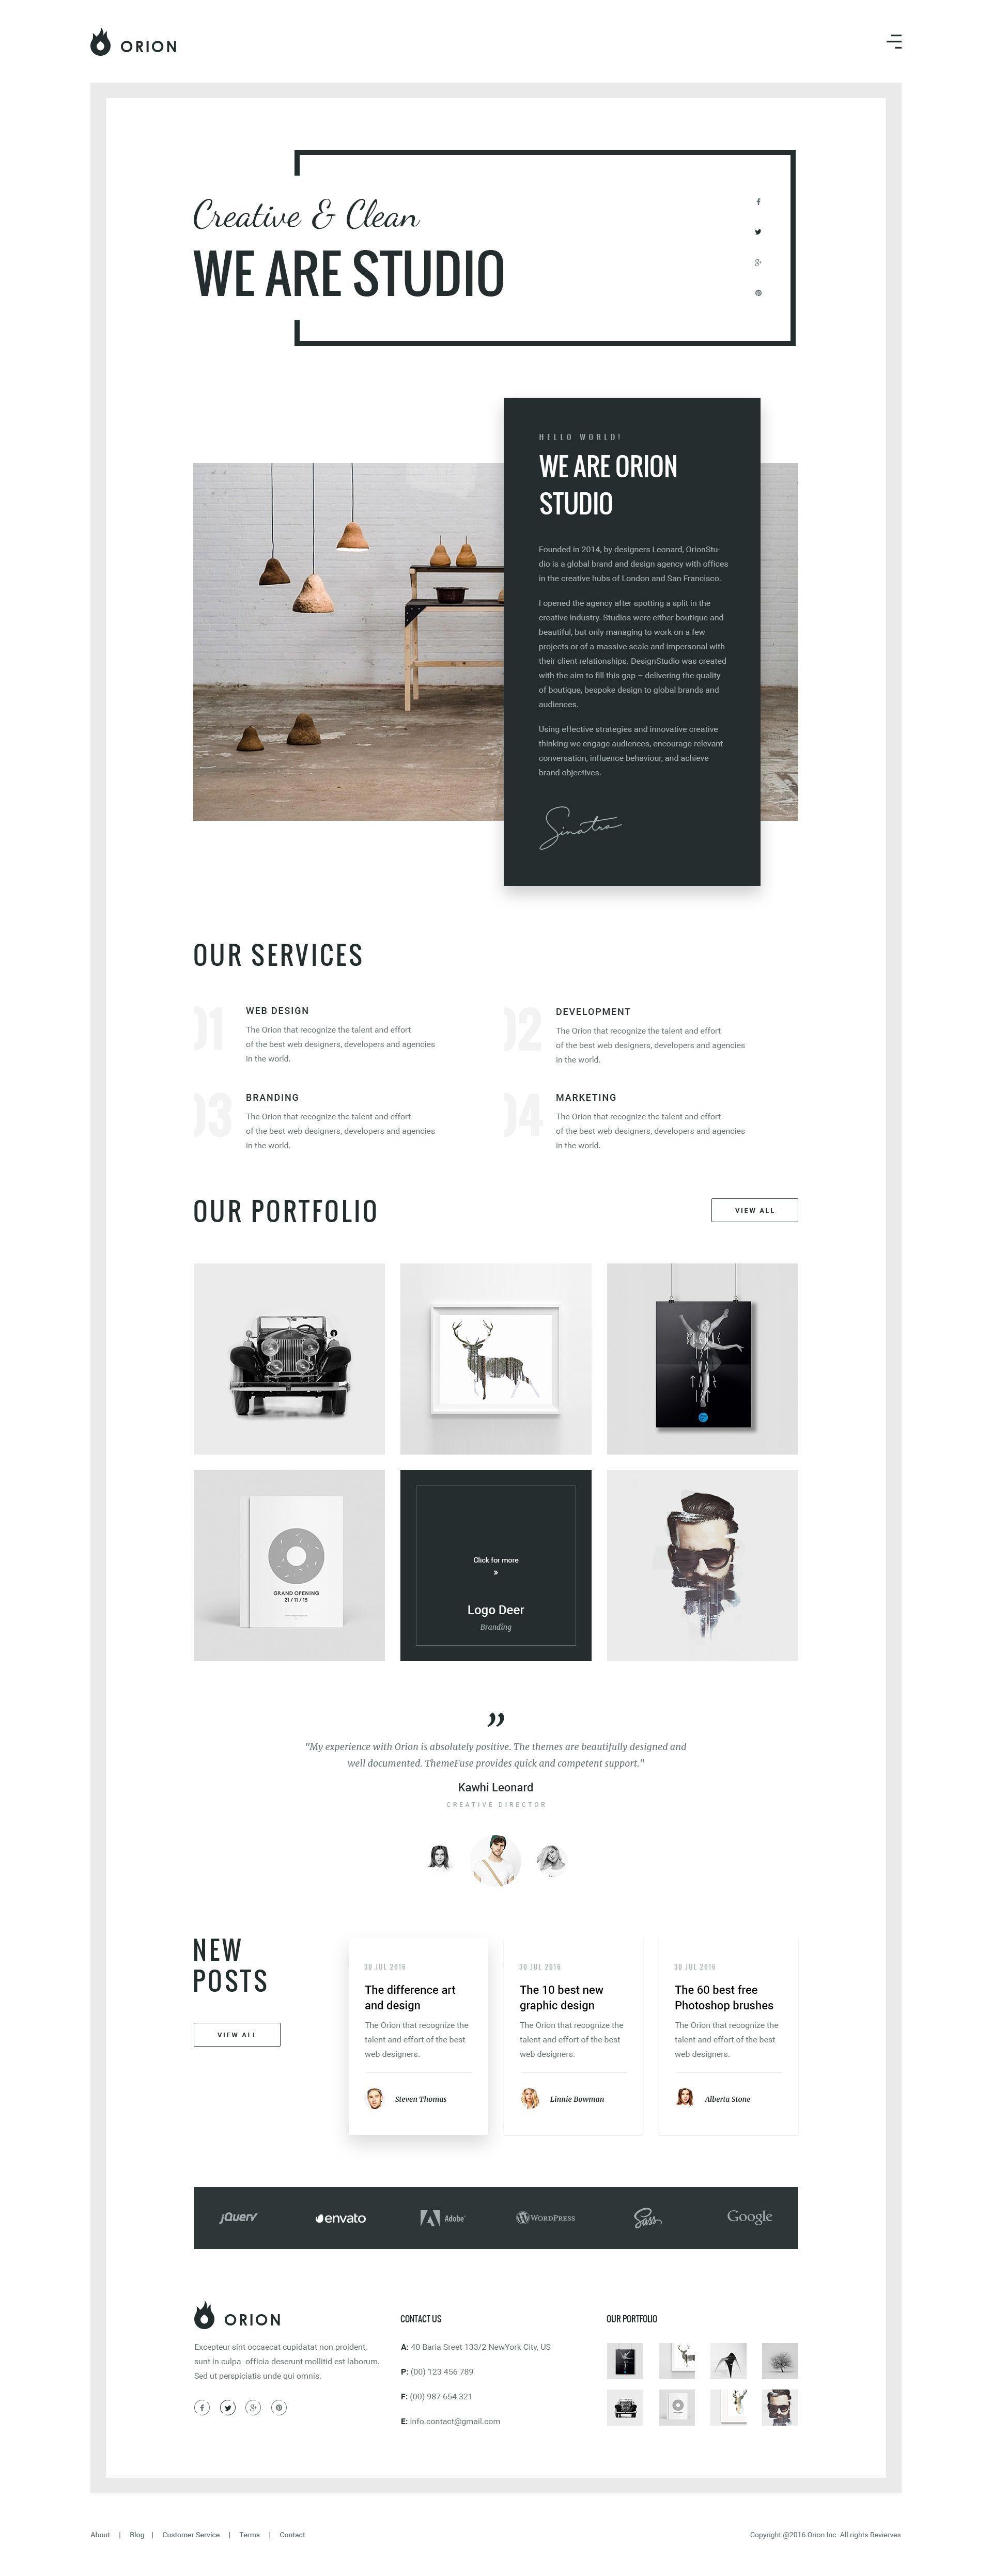 Responsive Web Design 575264552403771231 In 2020 Website Design Layout Layout Design Web Layout Design